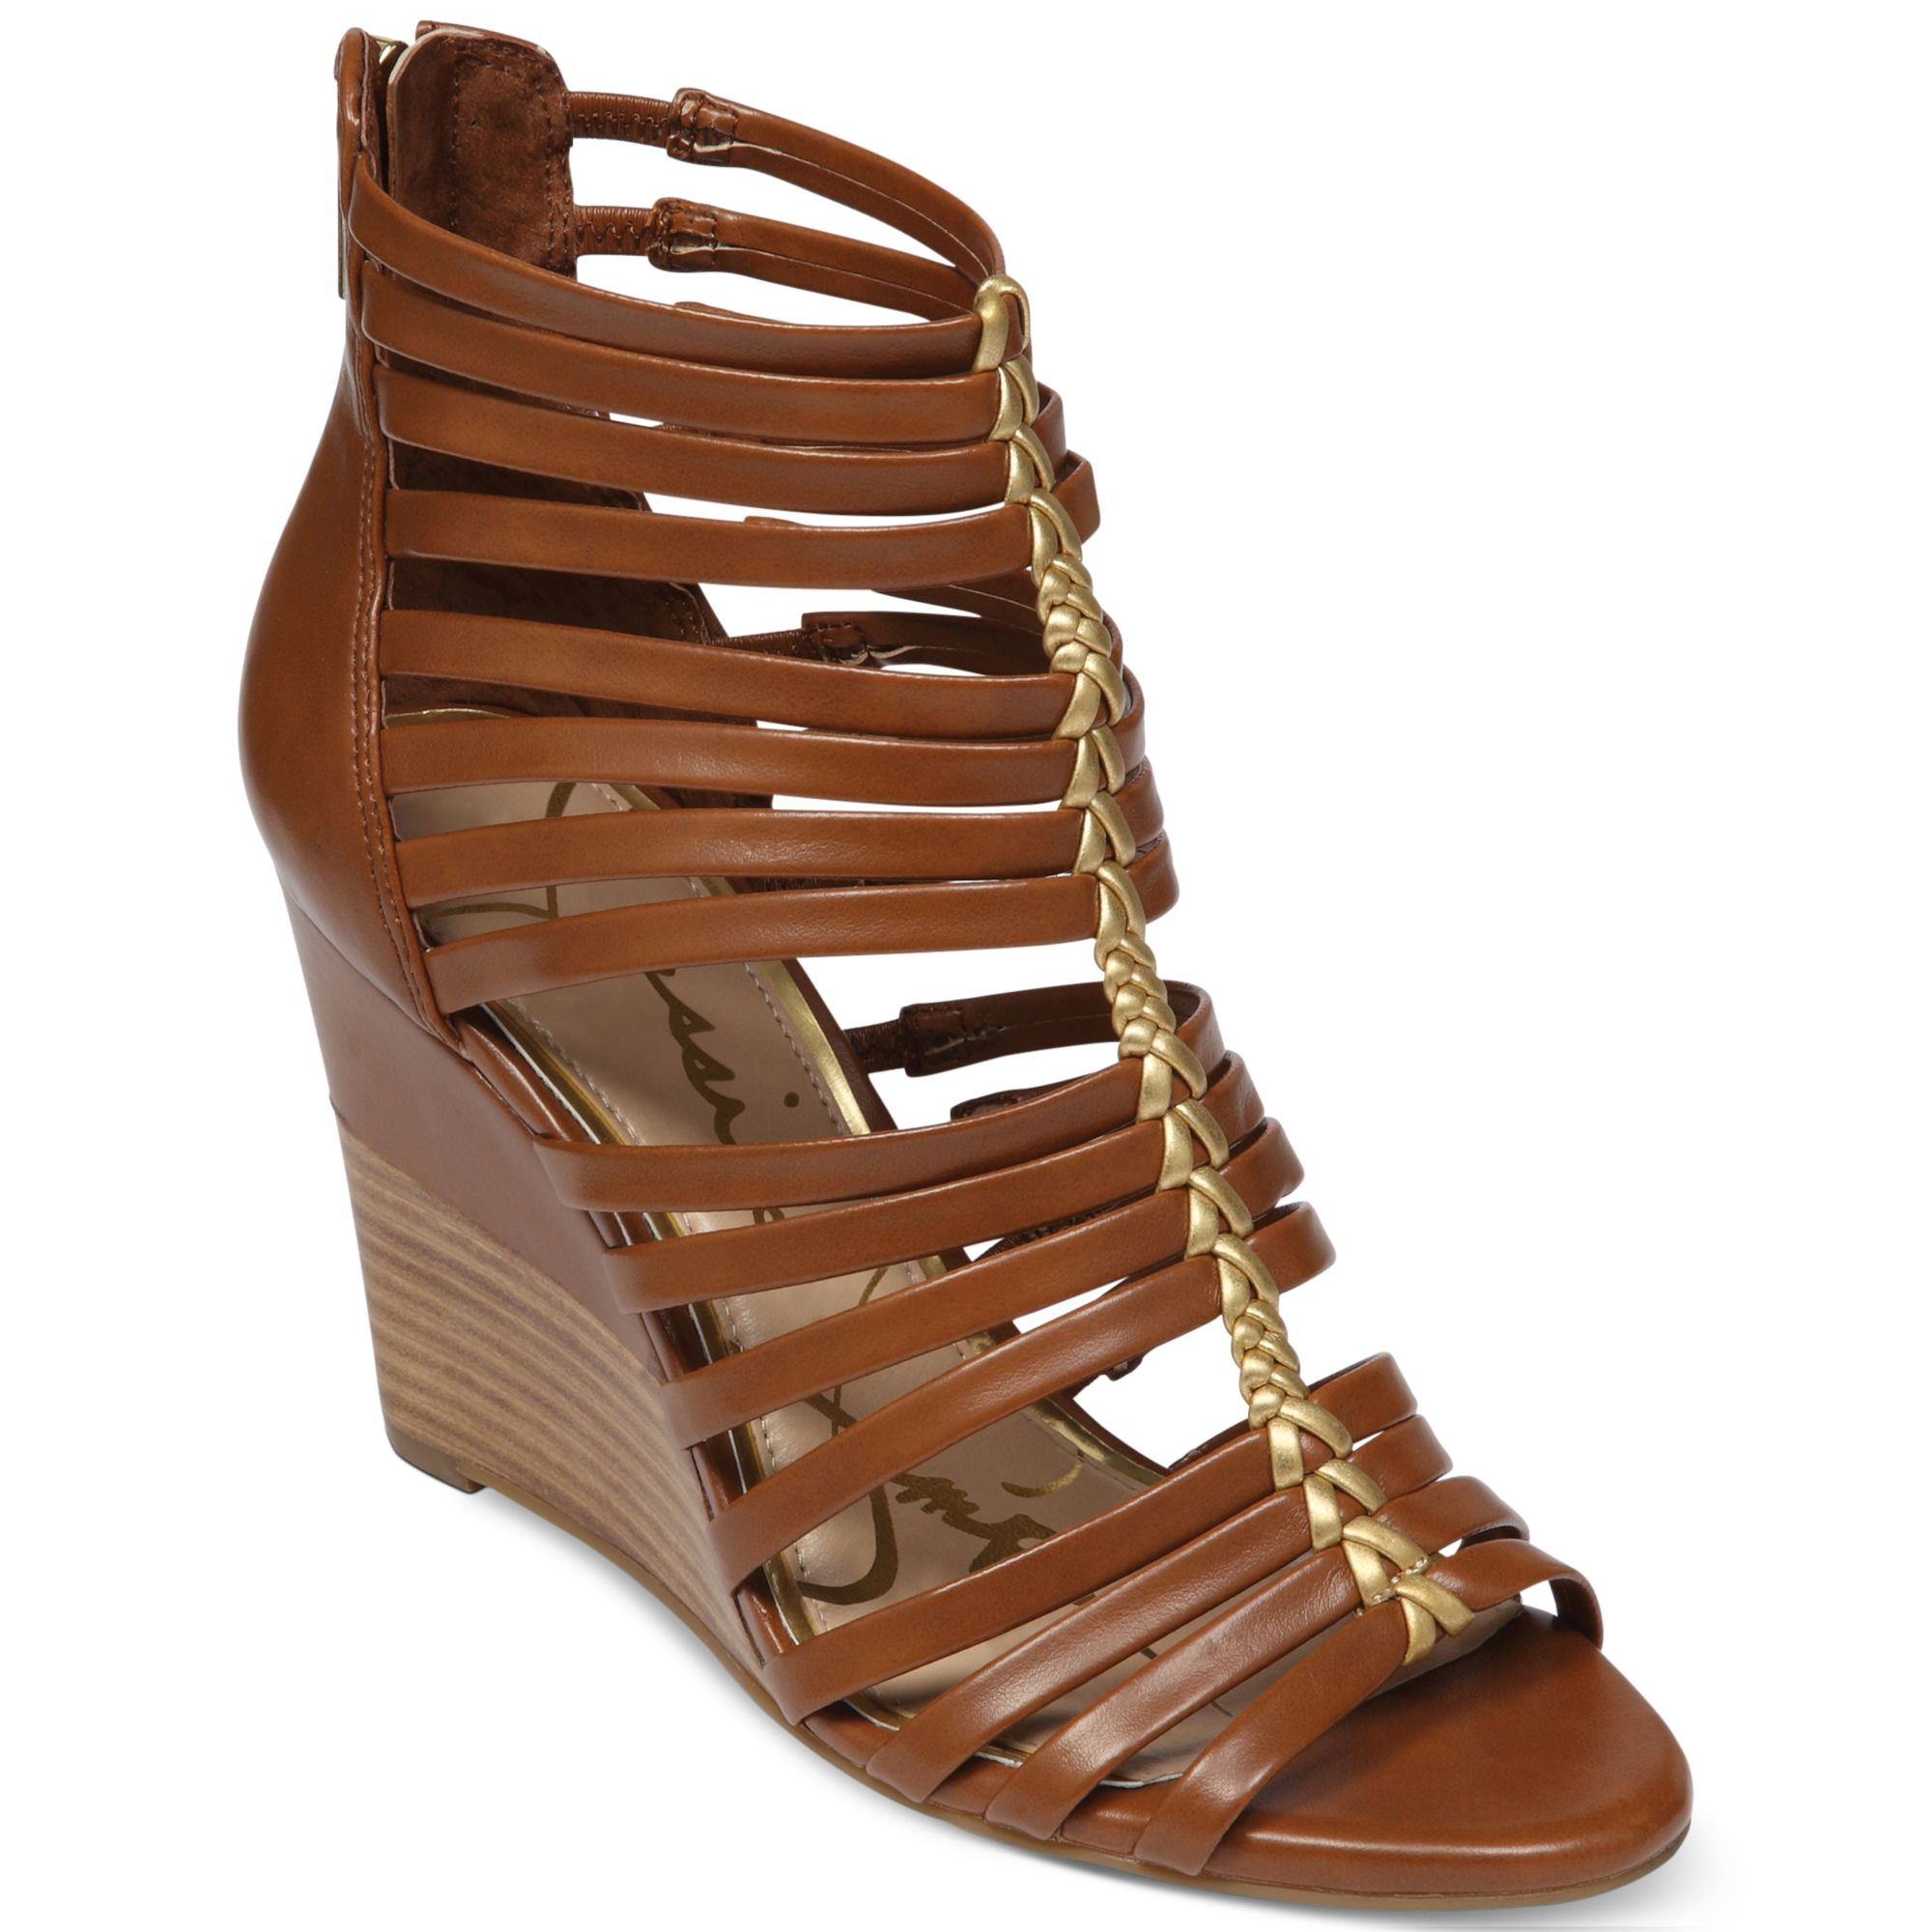 40ecf2114da Lyst - Jessica Simpson Miccy Wedge Gladiator Sandals in Brown